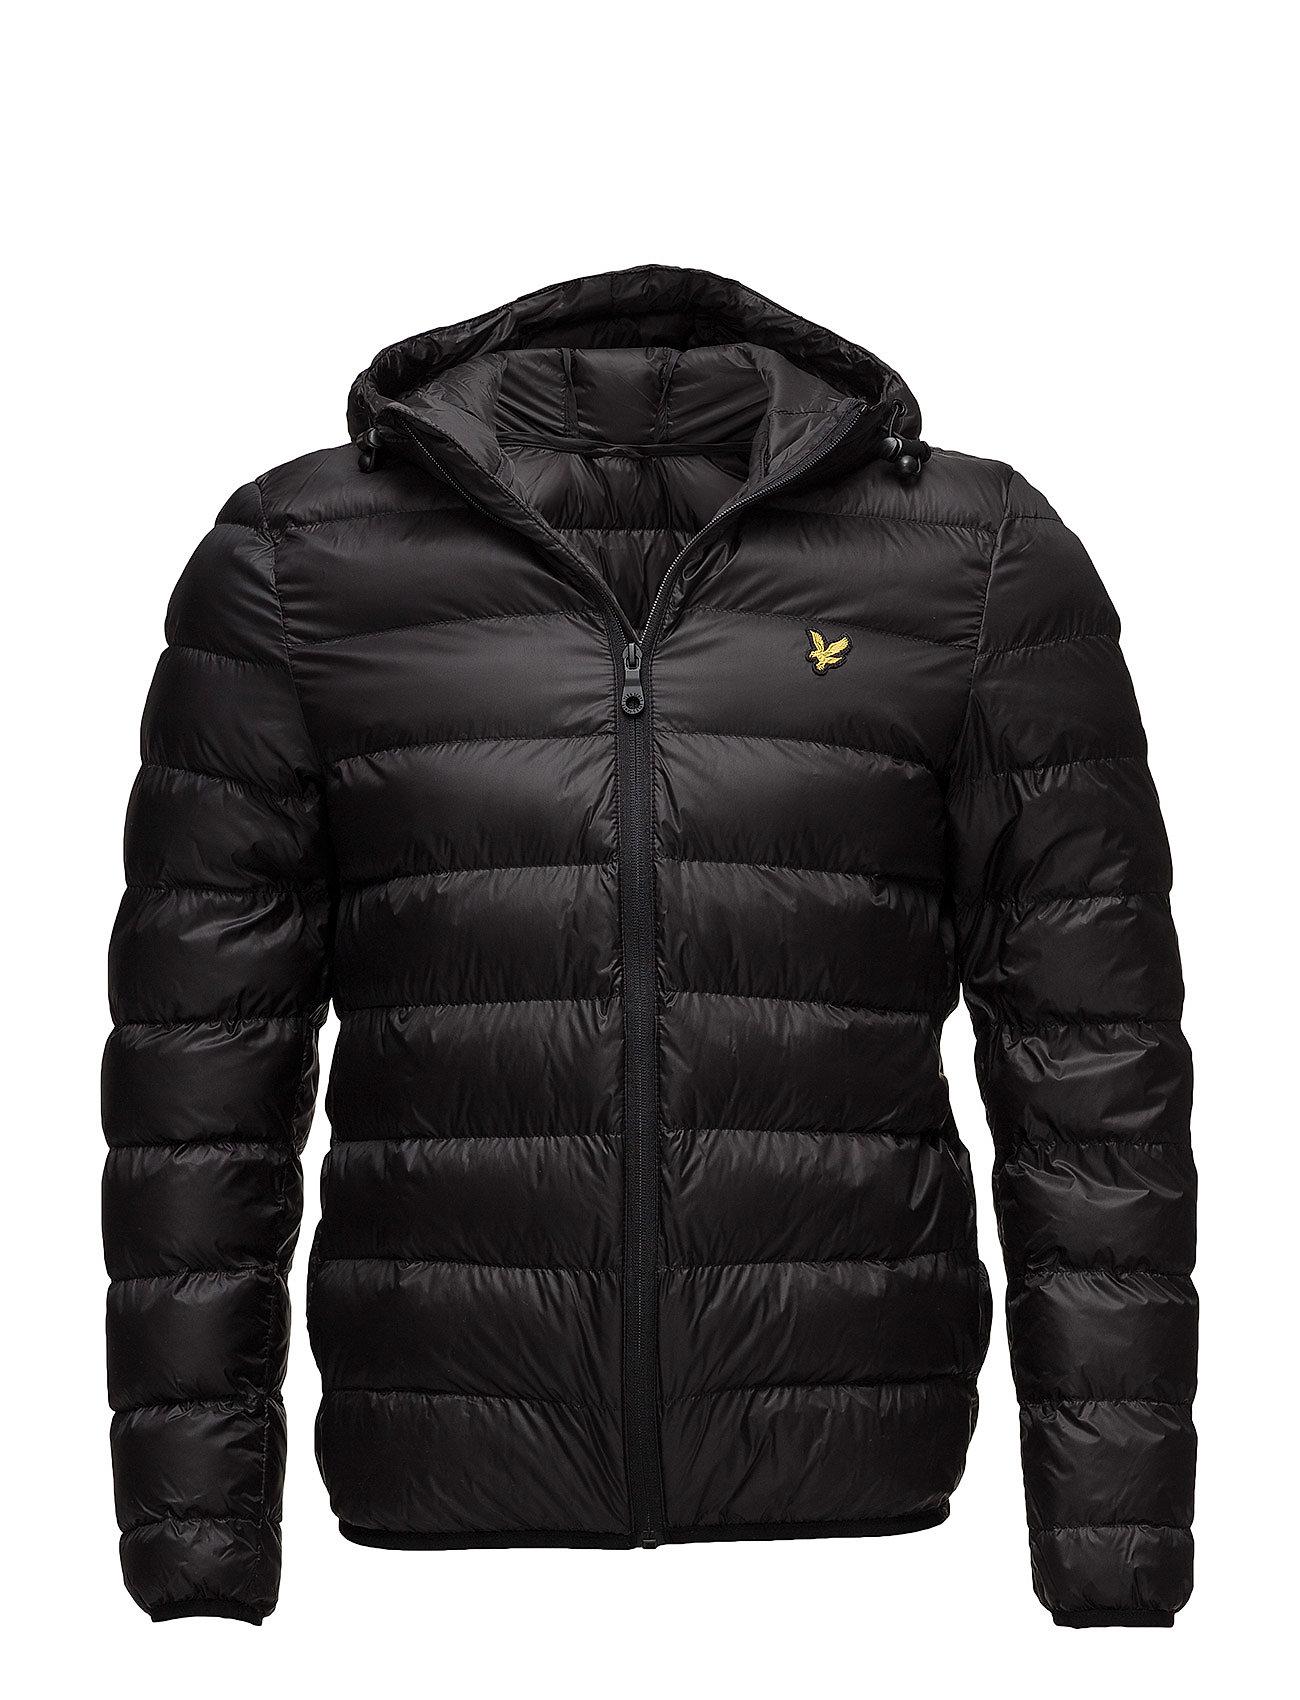 Lyle & Scott Lightweight Puffer Jacket - TRUE BLACK